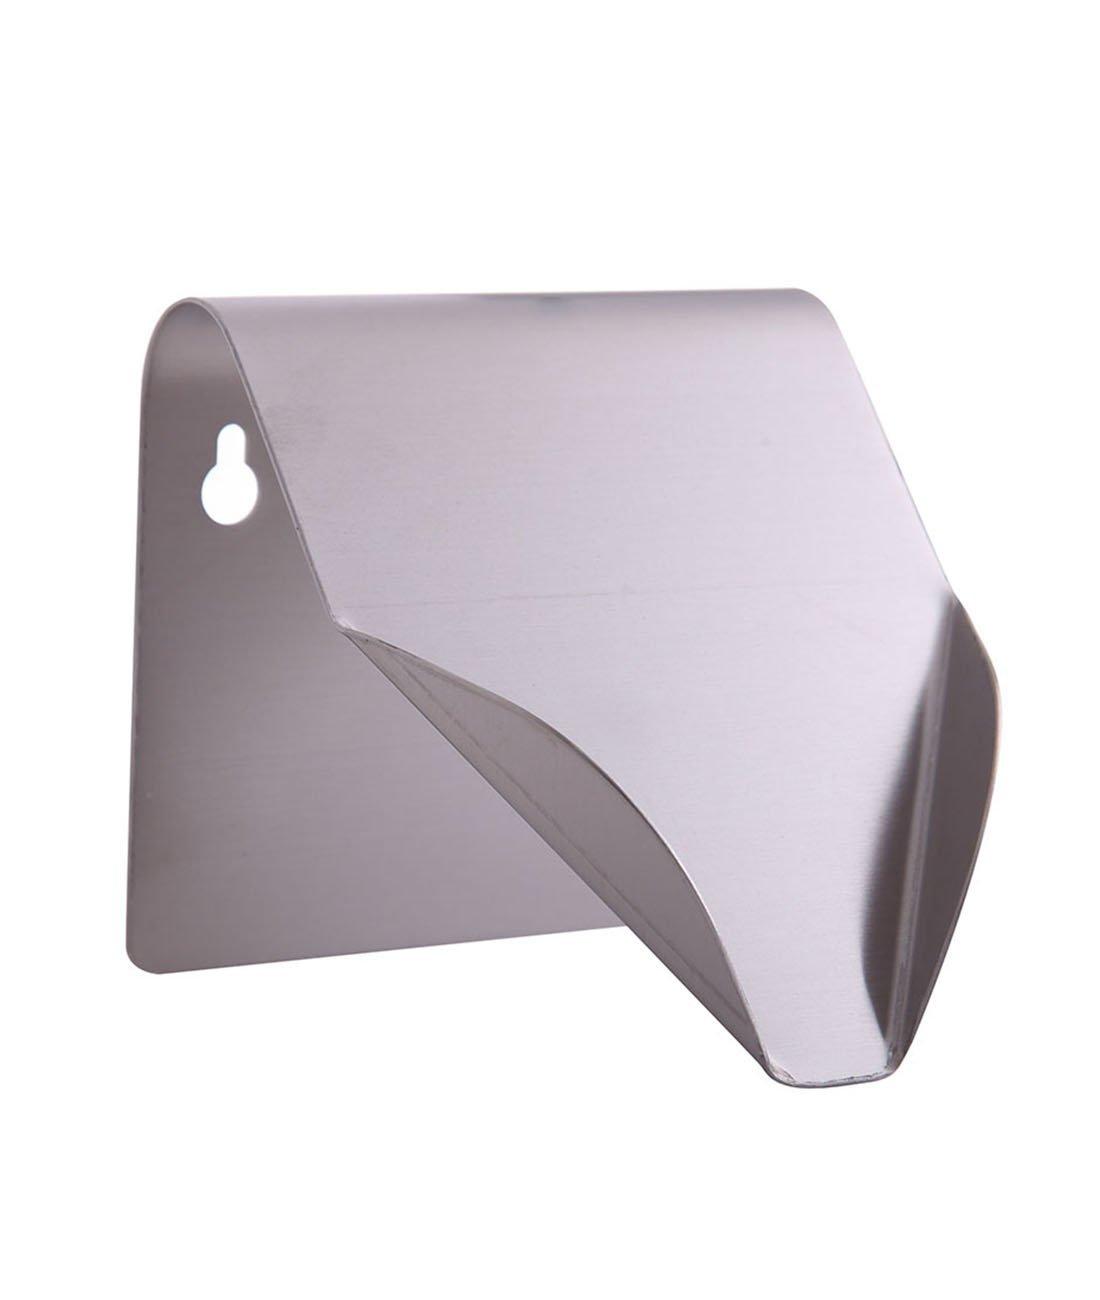 e6d07753d052e Cheap Hanging Soap Holder, find Hanging Soap Holder deals on line at ...